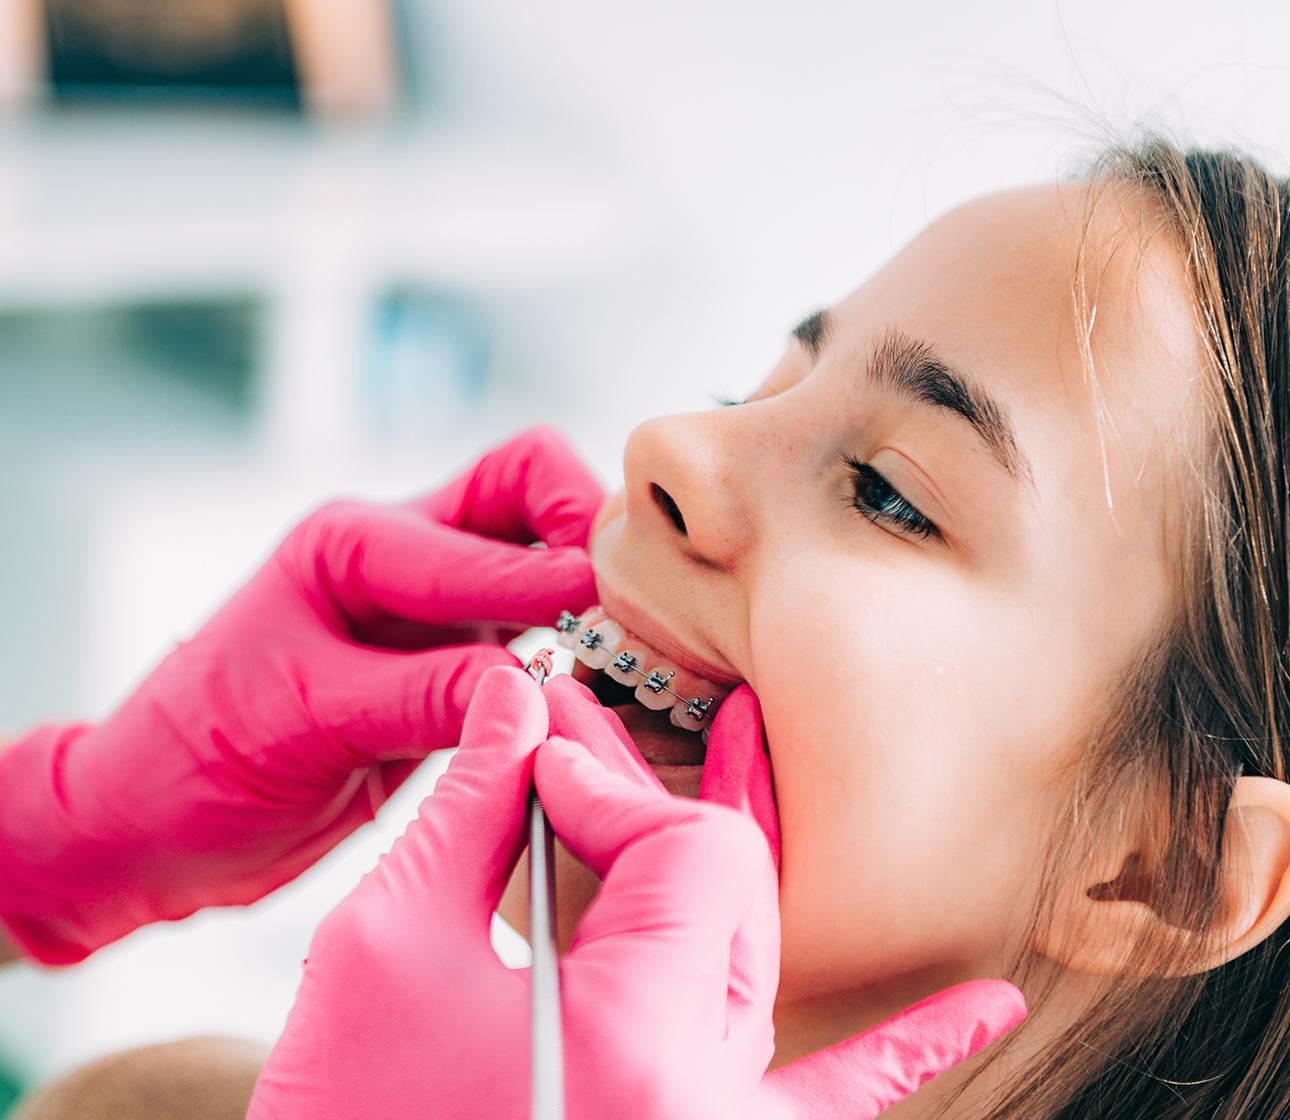 Smiley Dental Orthodontics Located in San Antonio, Dallas-Fort Worth, and more!